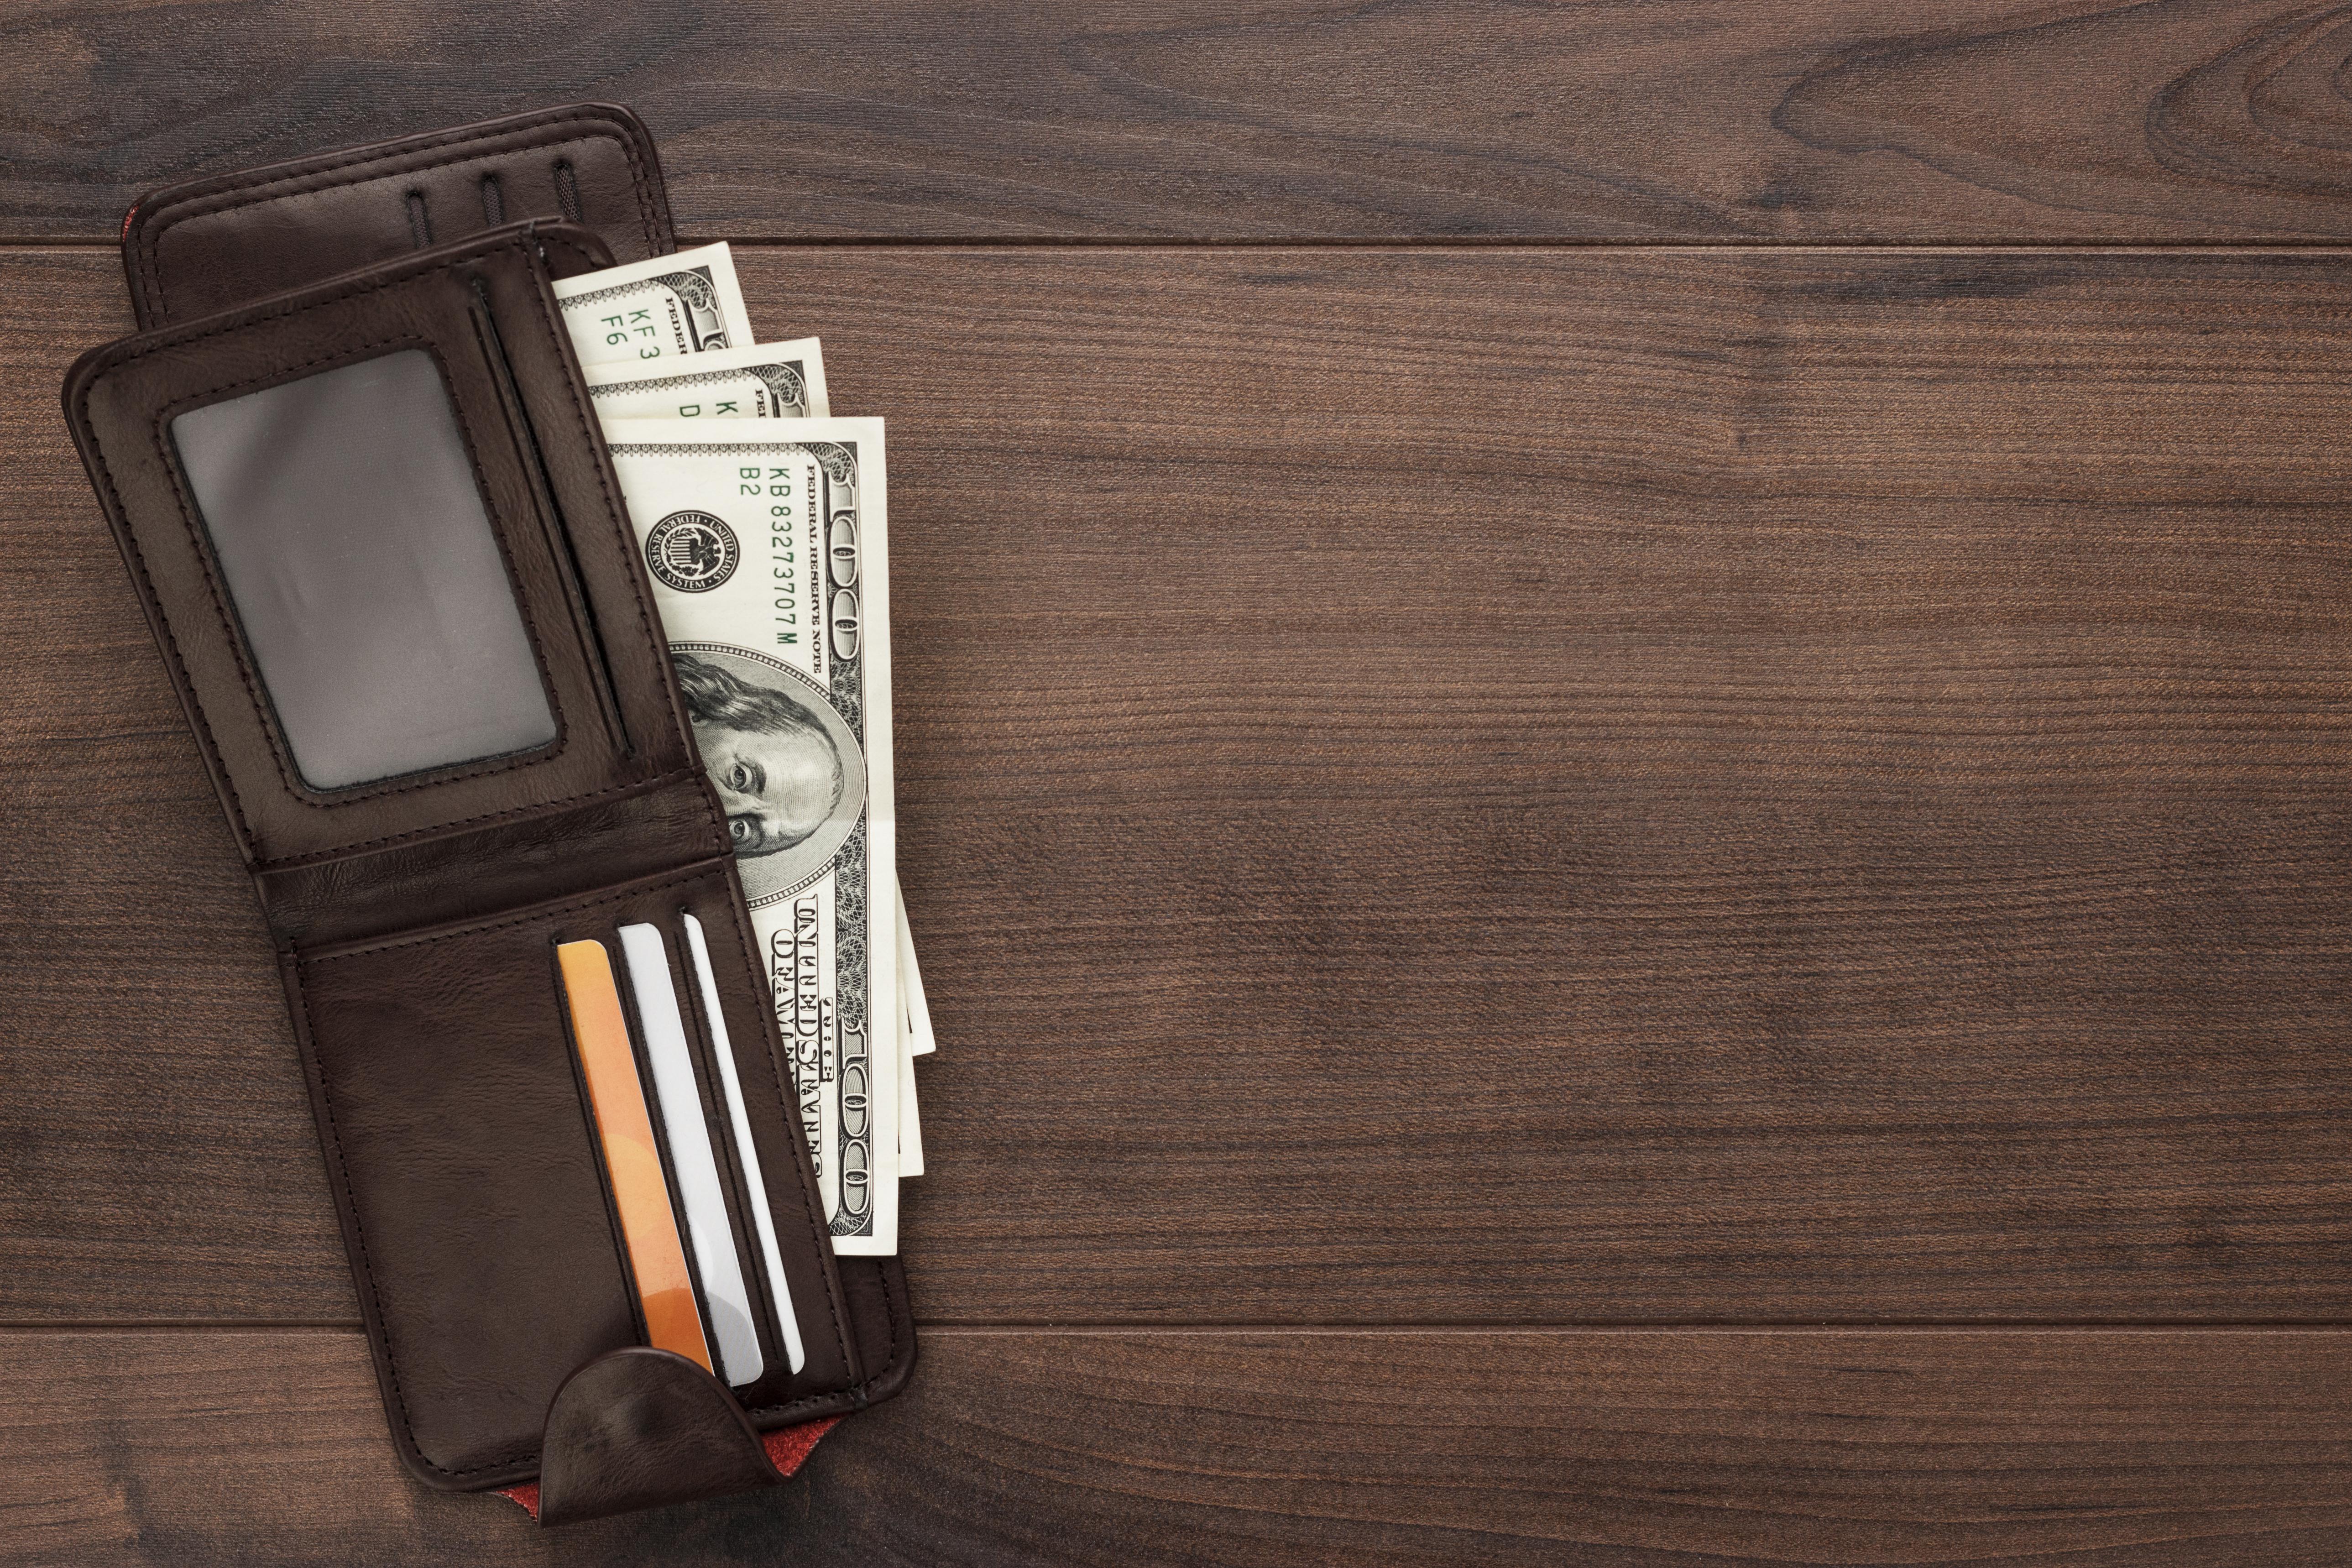 Spend Money on Social Media